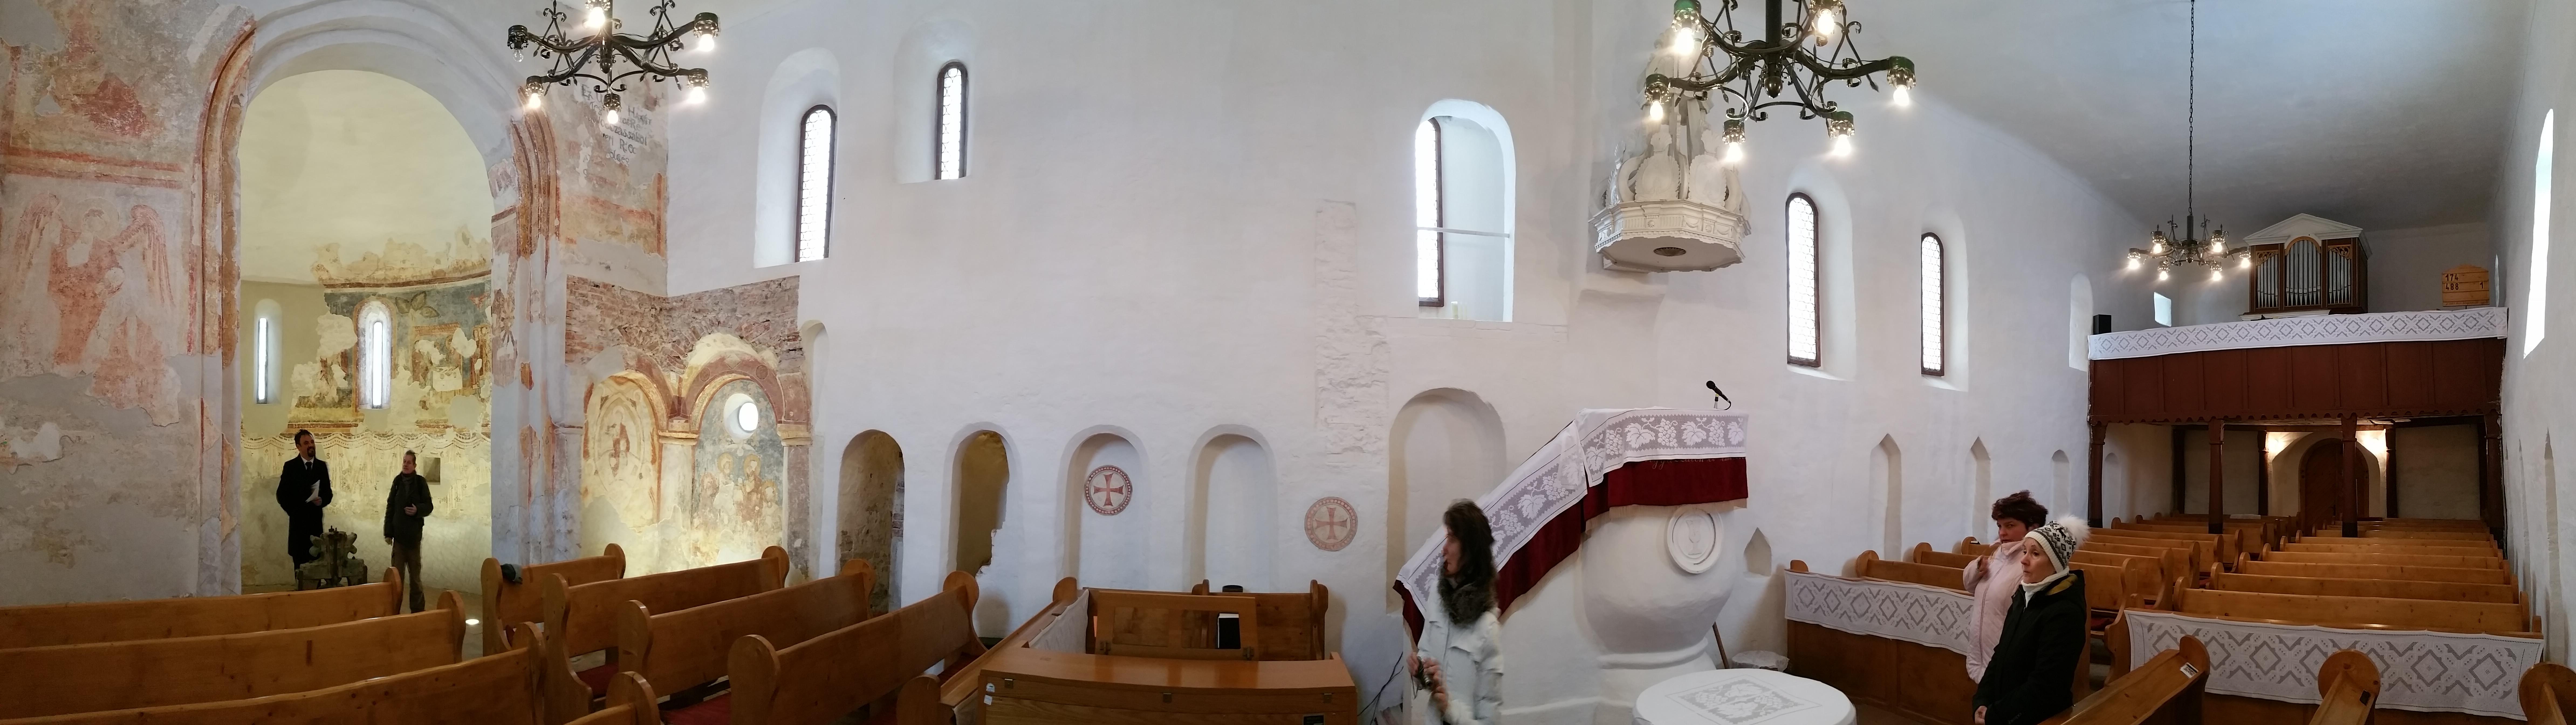 A templom belső panorámaképe